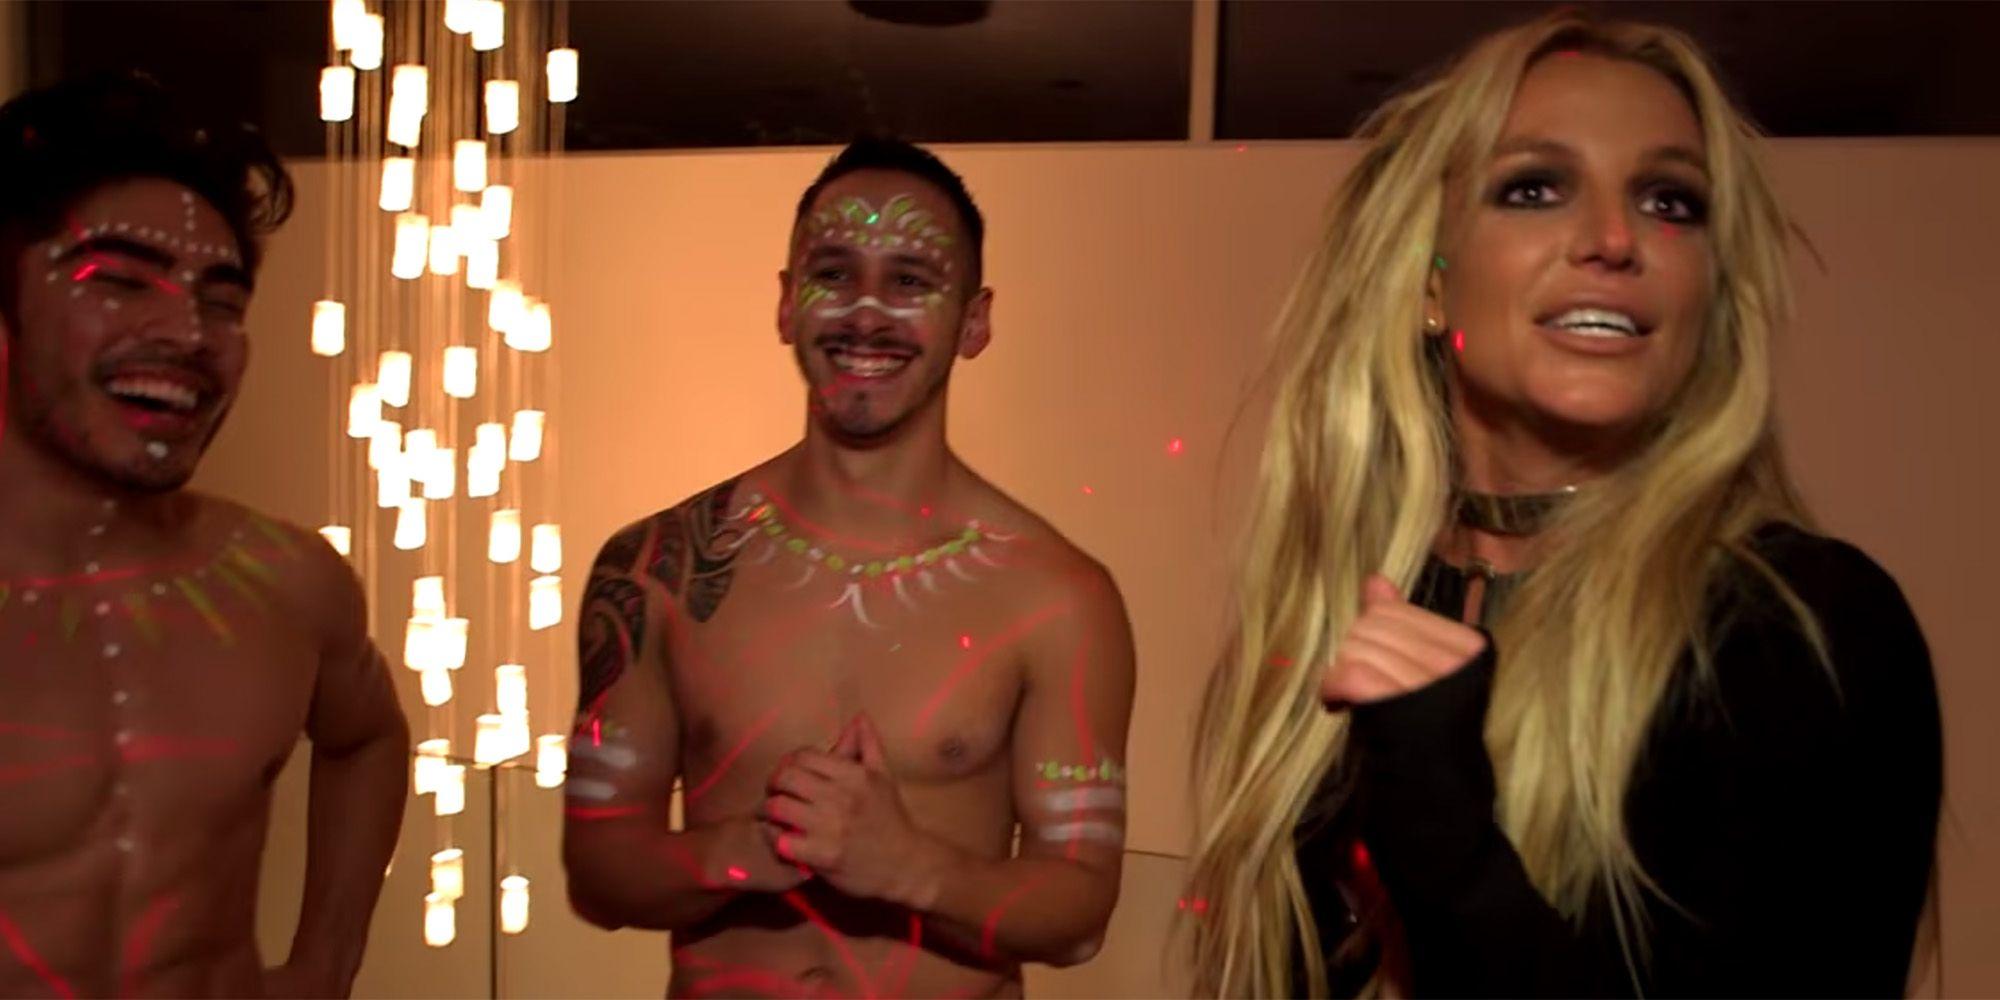 Britney Spears Pranks Jimmy Kimmel with Half Naked Dancers - Britney ...